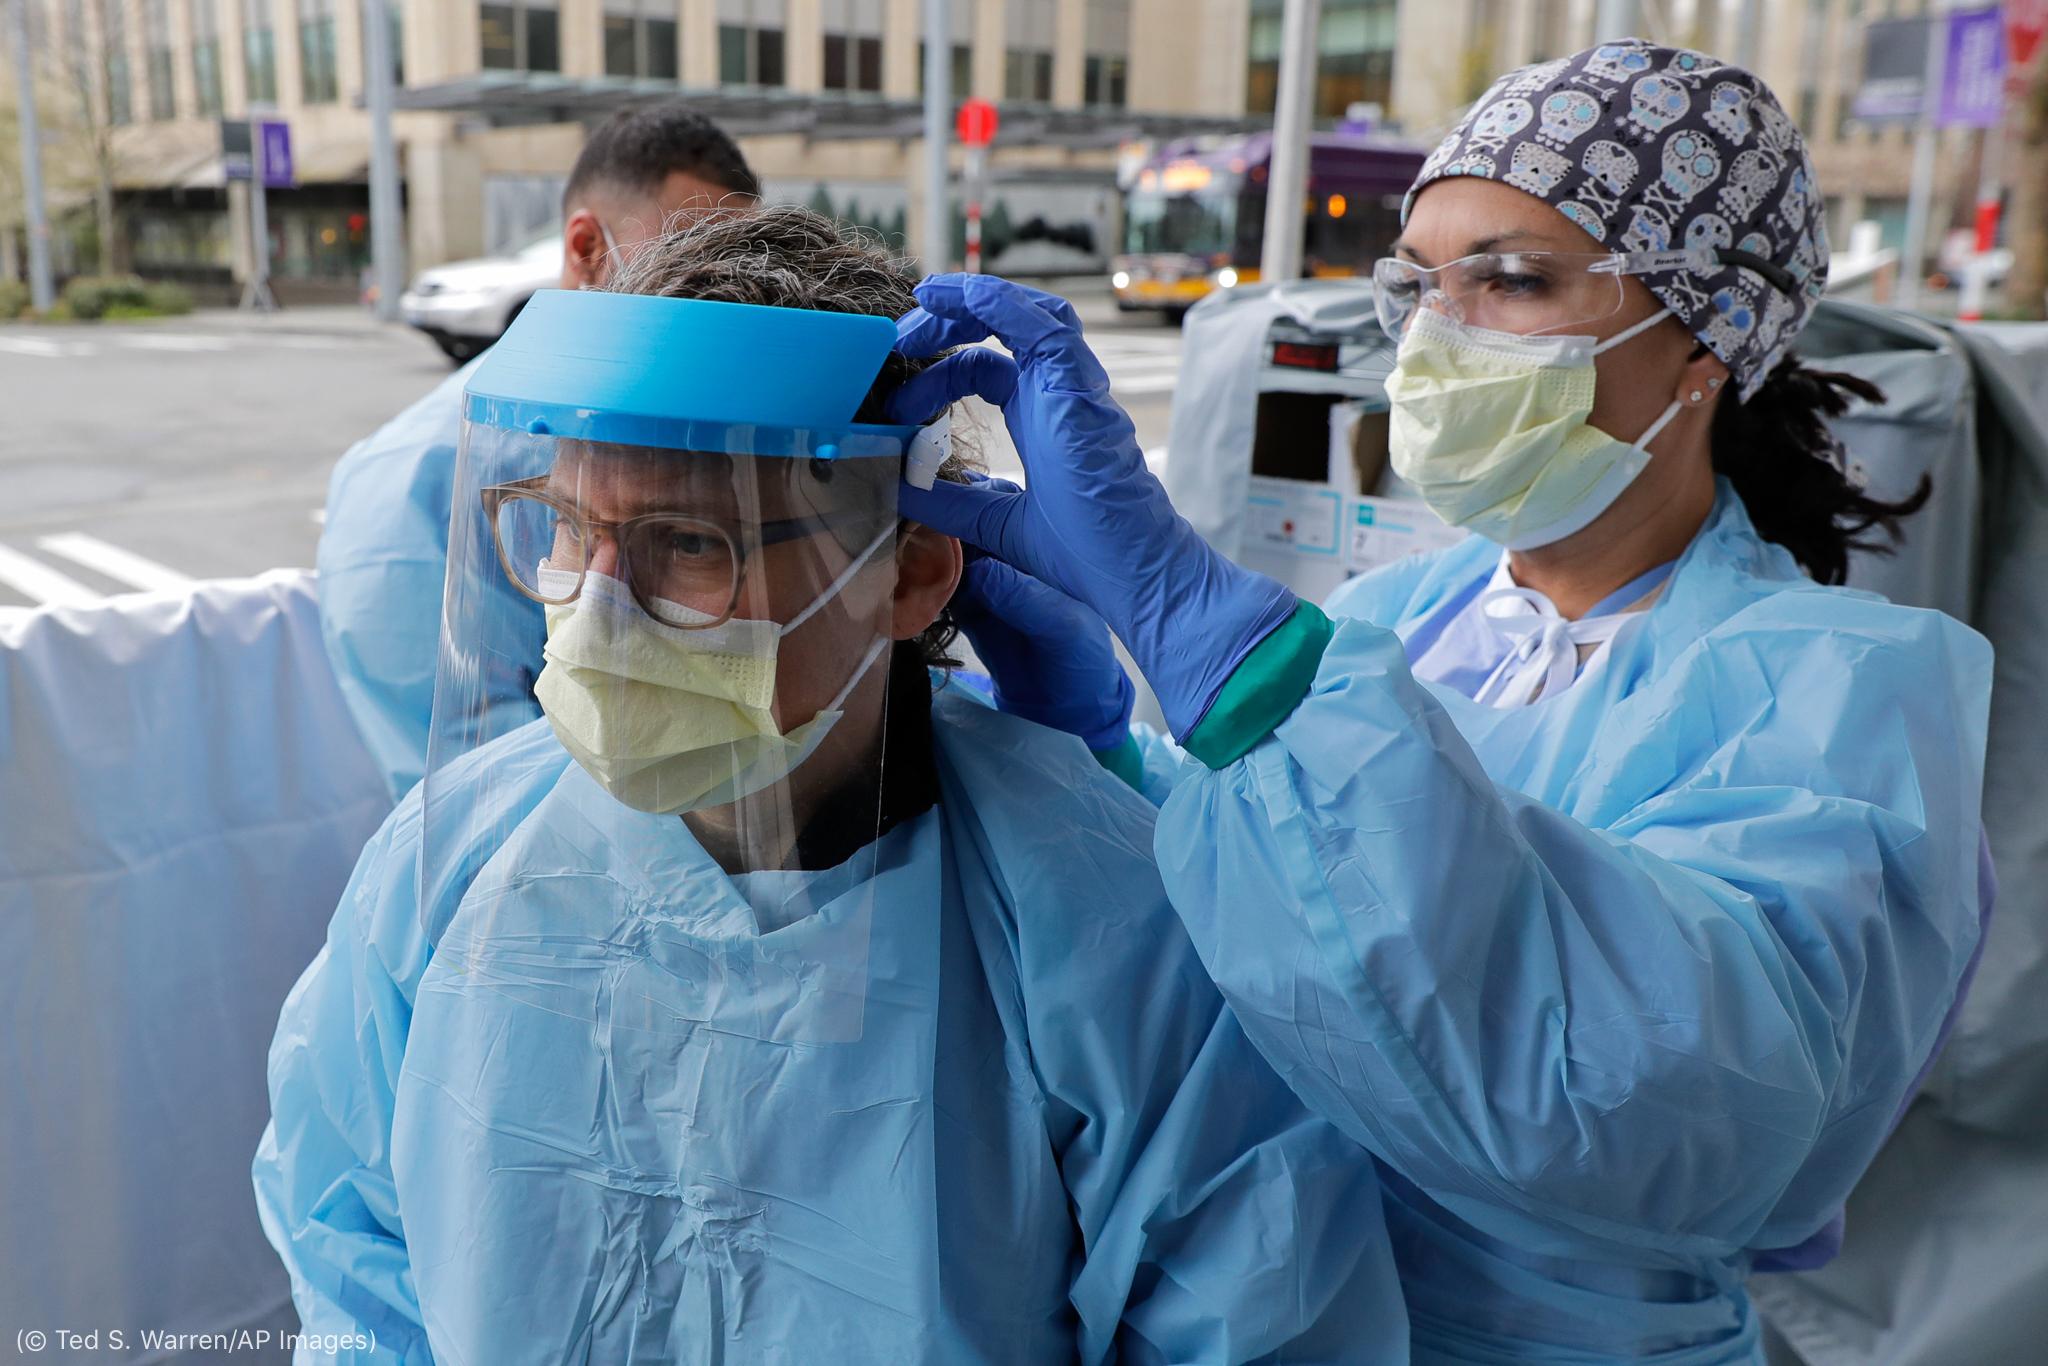 Wanita dengan baju pelindung berwarna biru membantu rekannya mengenakan pelindung wajah (© Ted S. Warren/AP Images)